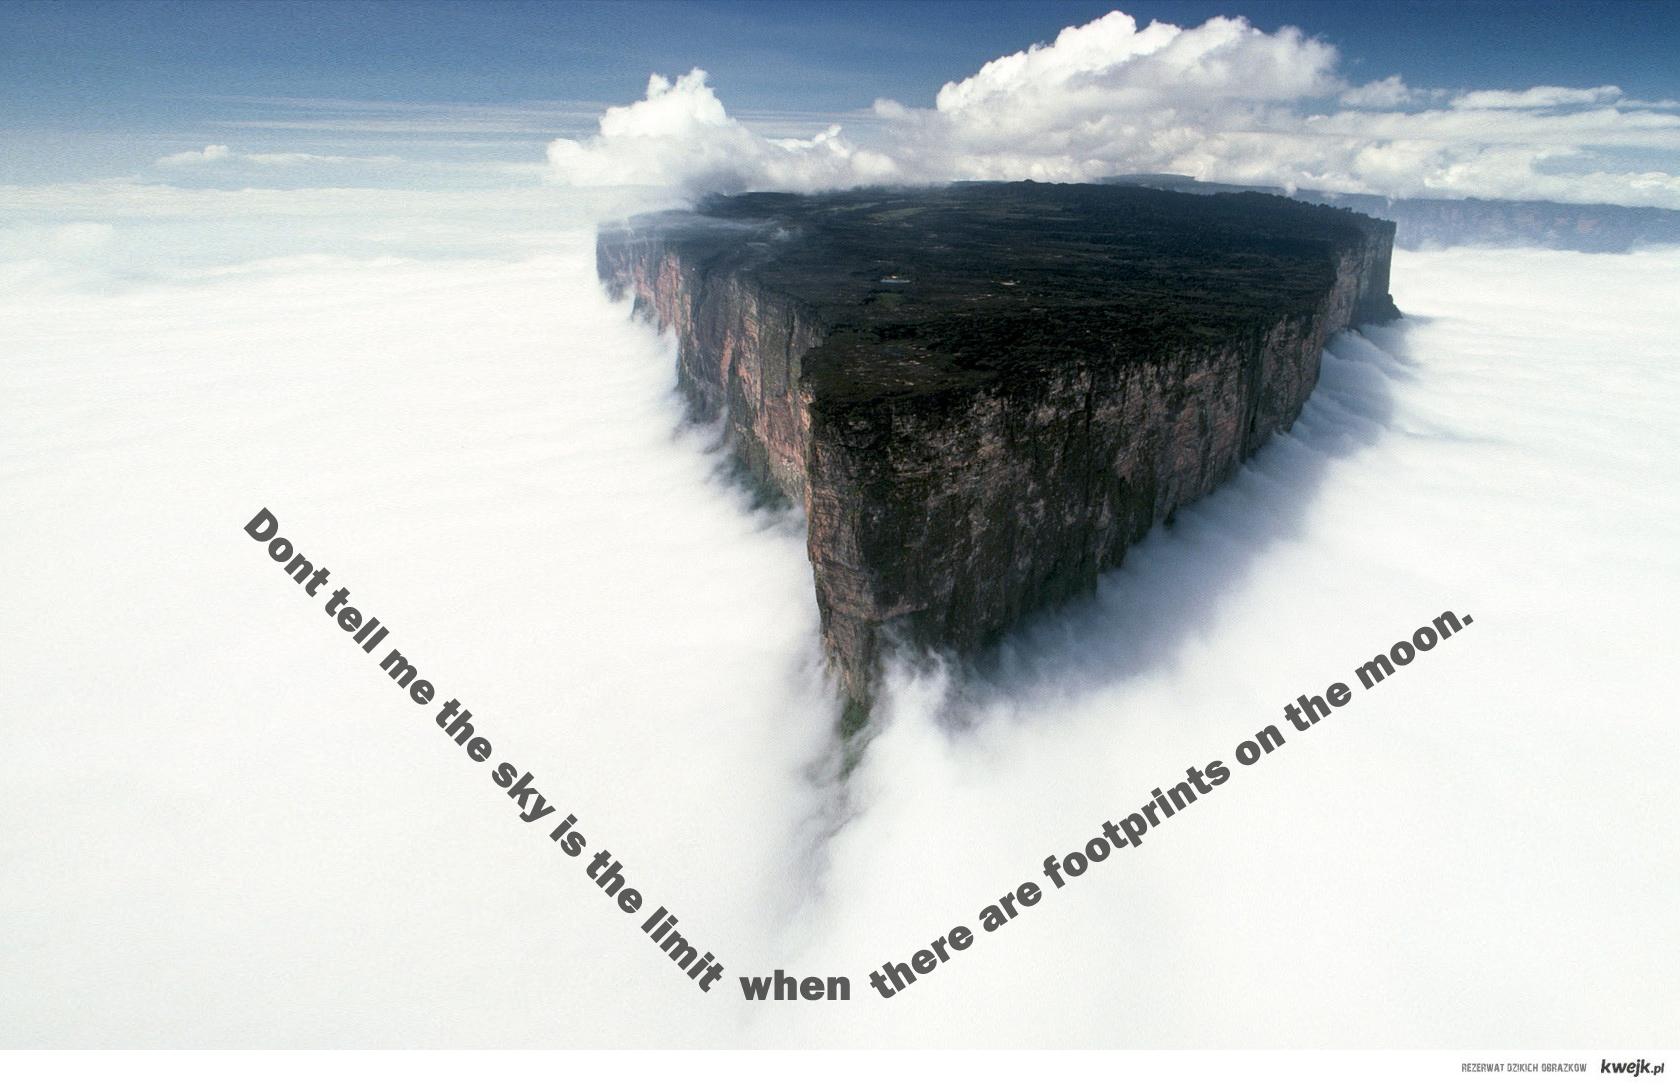 sky isn't the limit